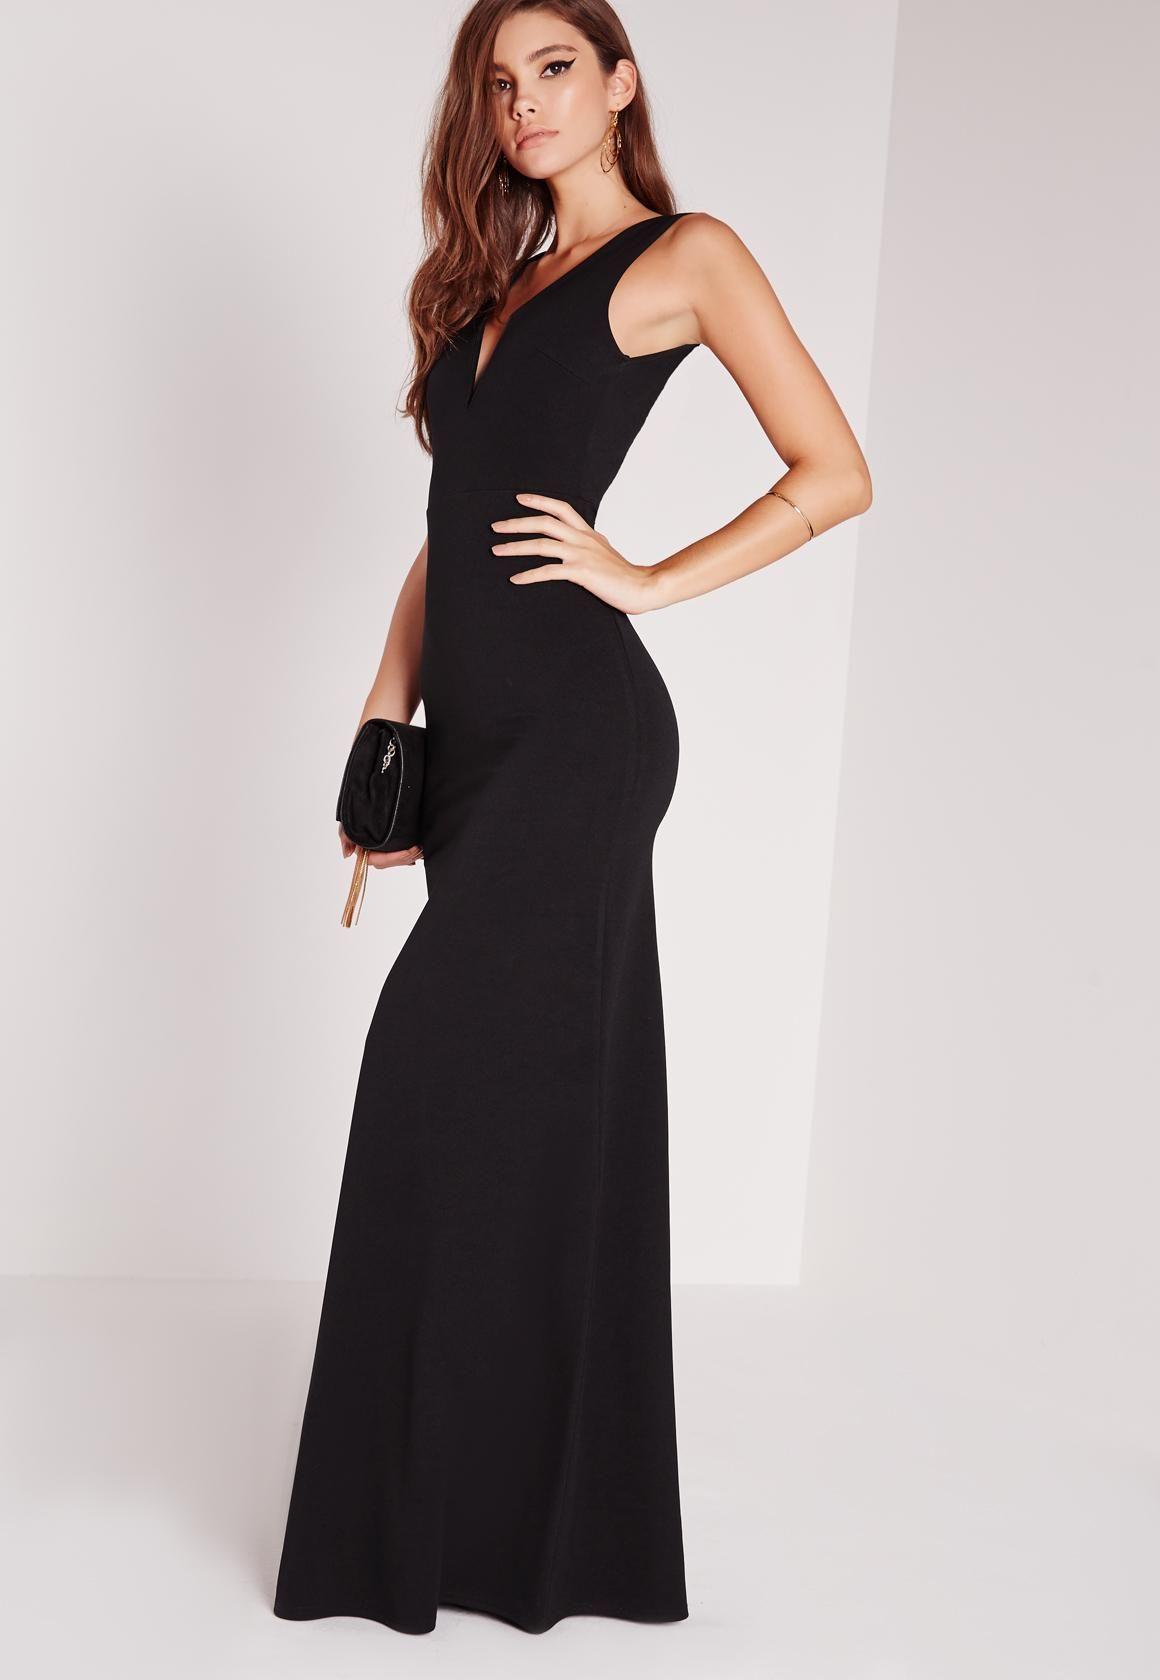 5e8a027c447 Missguided - Vestido largo con cuello en v escotado negro